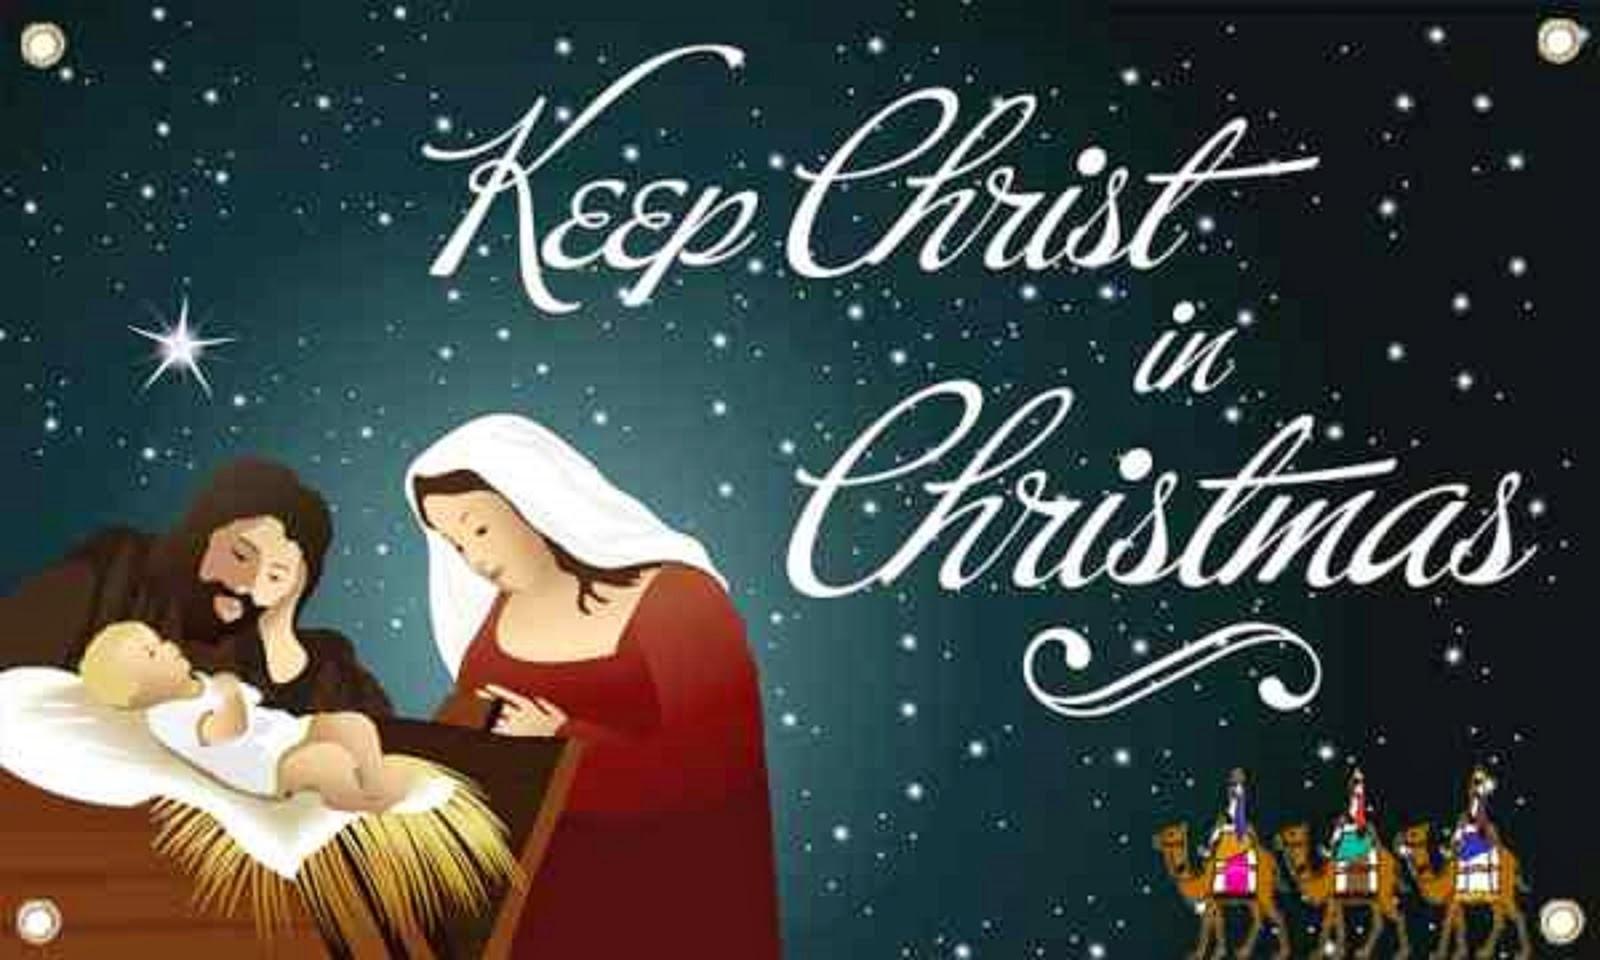 HELP KEEP CHRIST IN CHRISTMAS